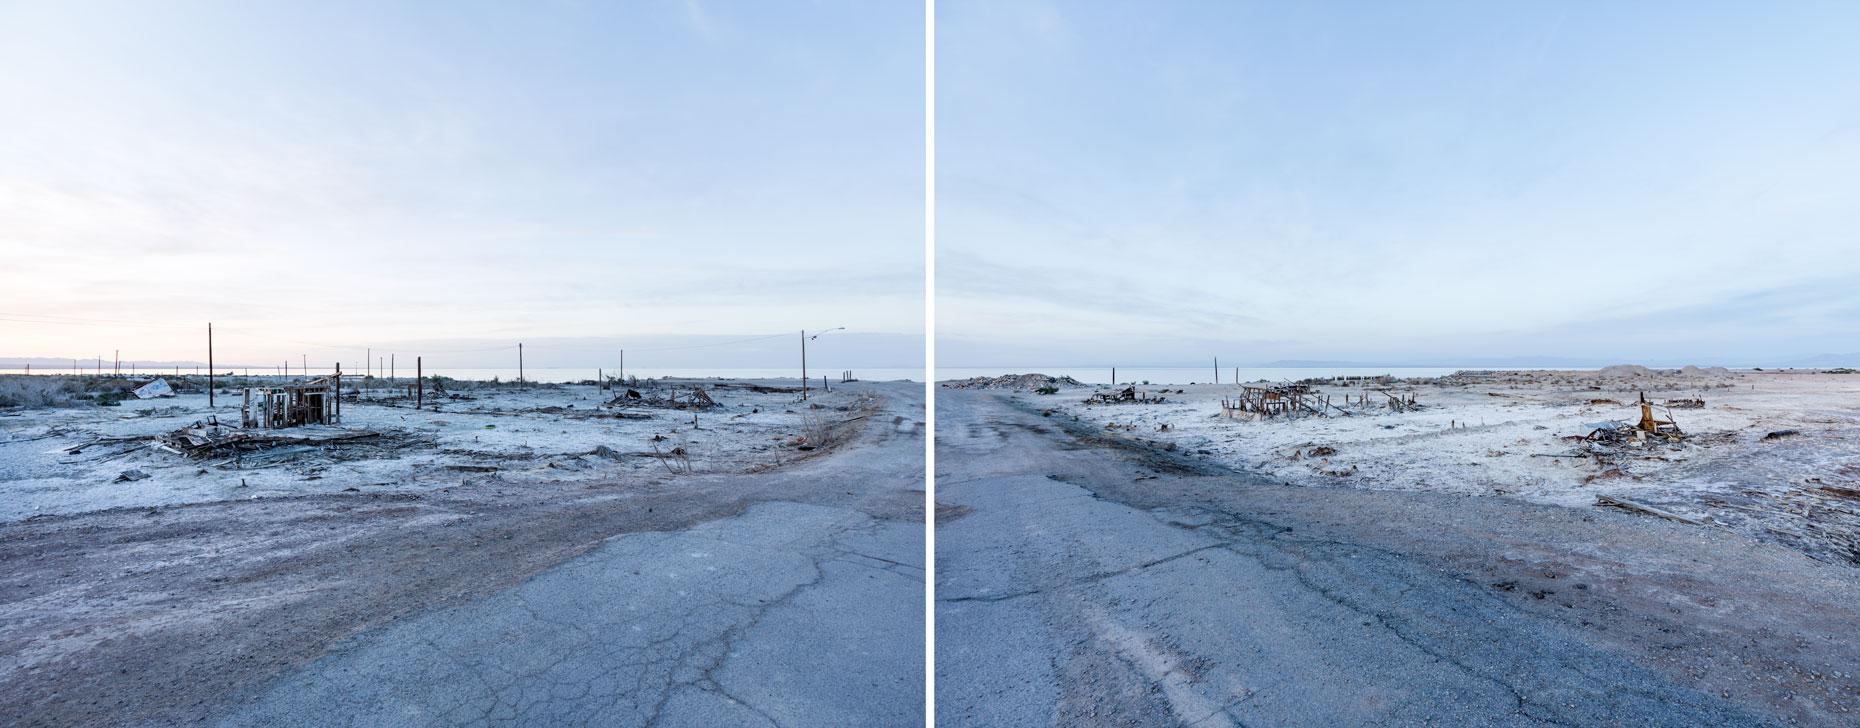 Jordan_Reeder_SS_016_Cracking-road-Salton-Sea-Jordan-Reeder.jpg